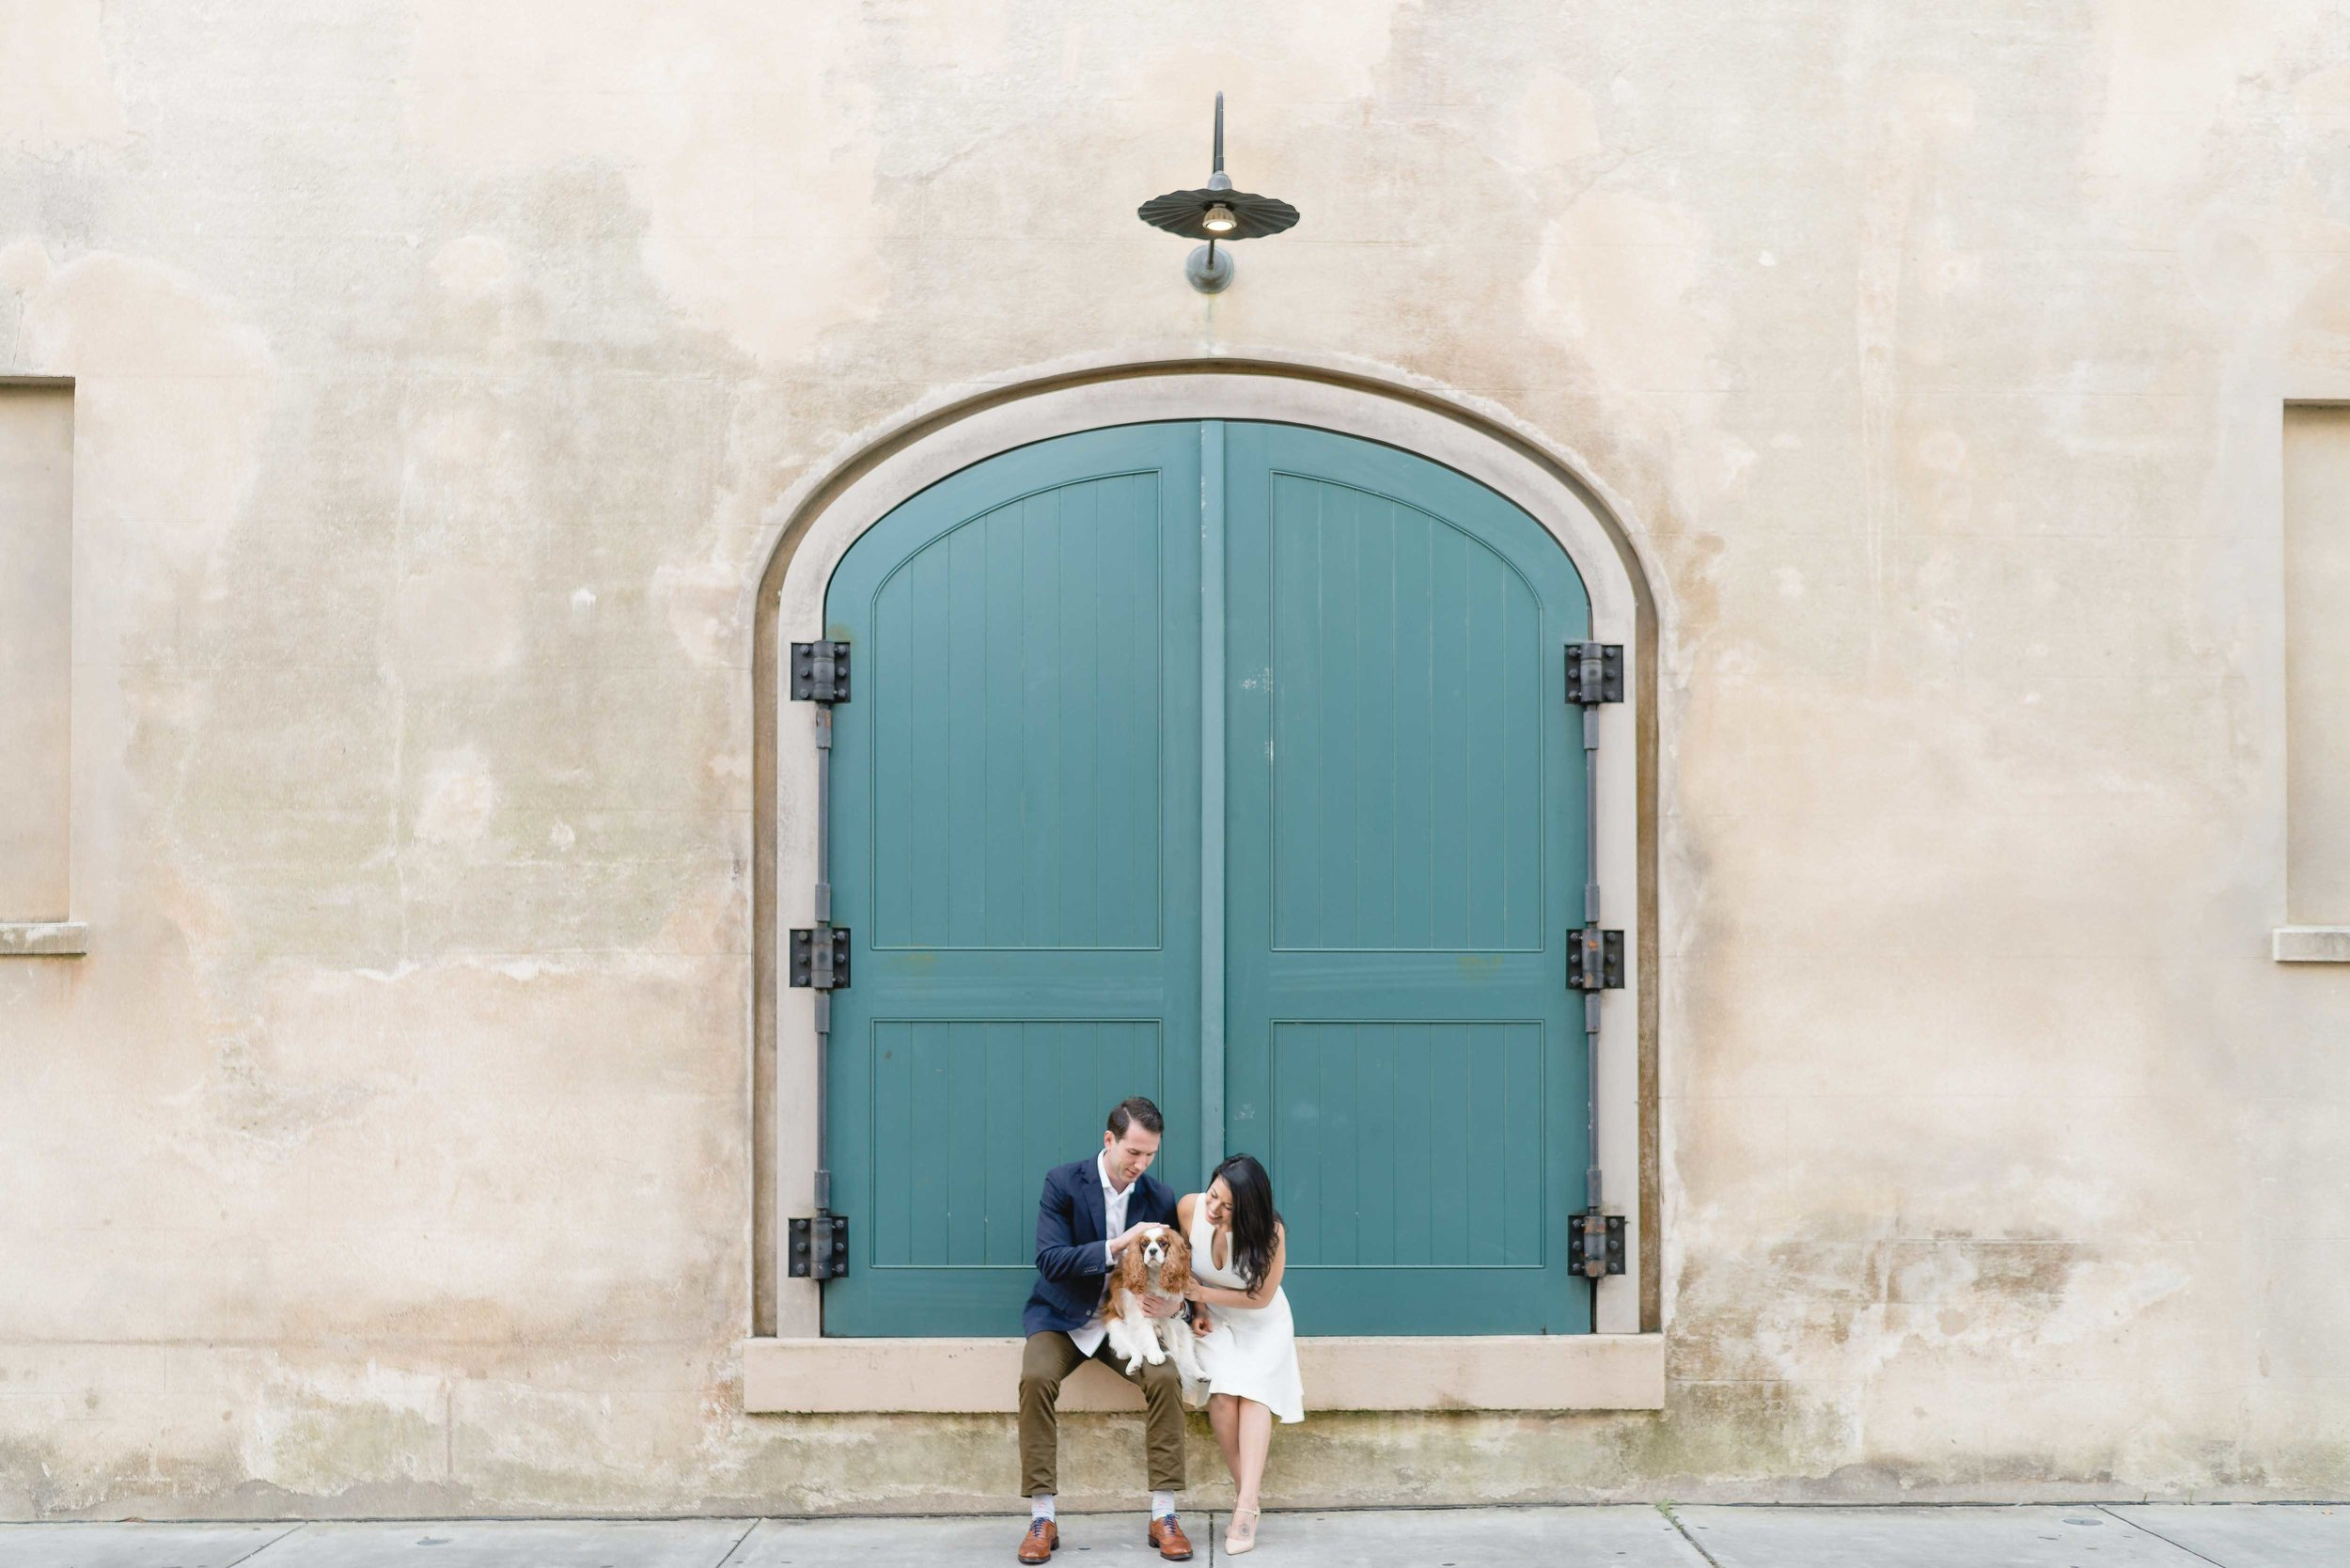 Digital_Spark_Weddings_Photo_Charleston_Charlotte_NC4.jpg